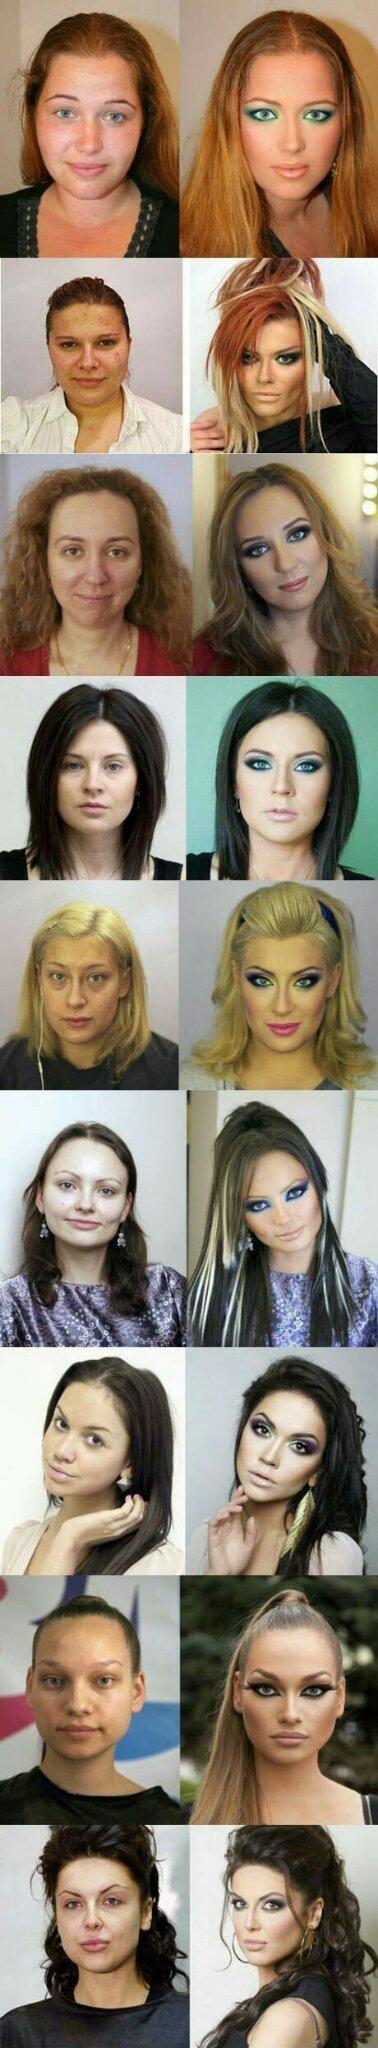 Makeup is a fool - meme